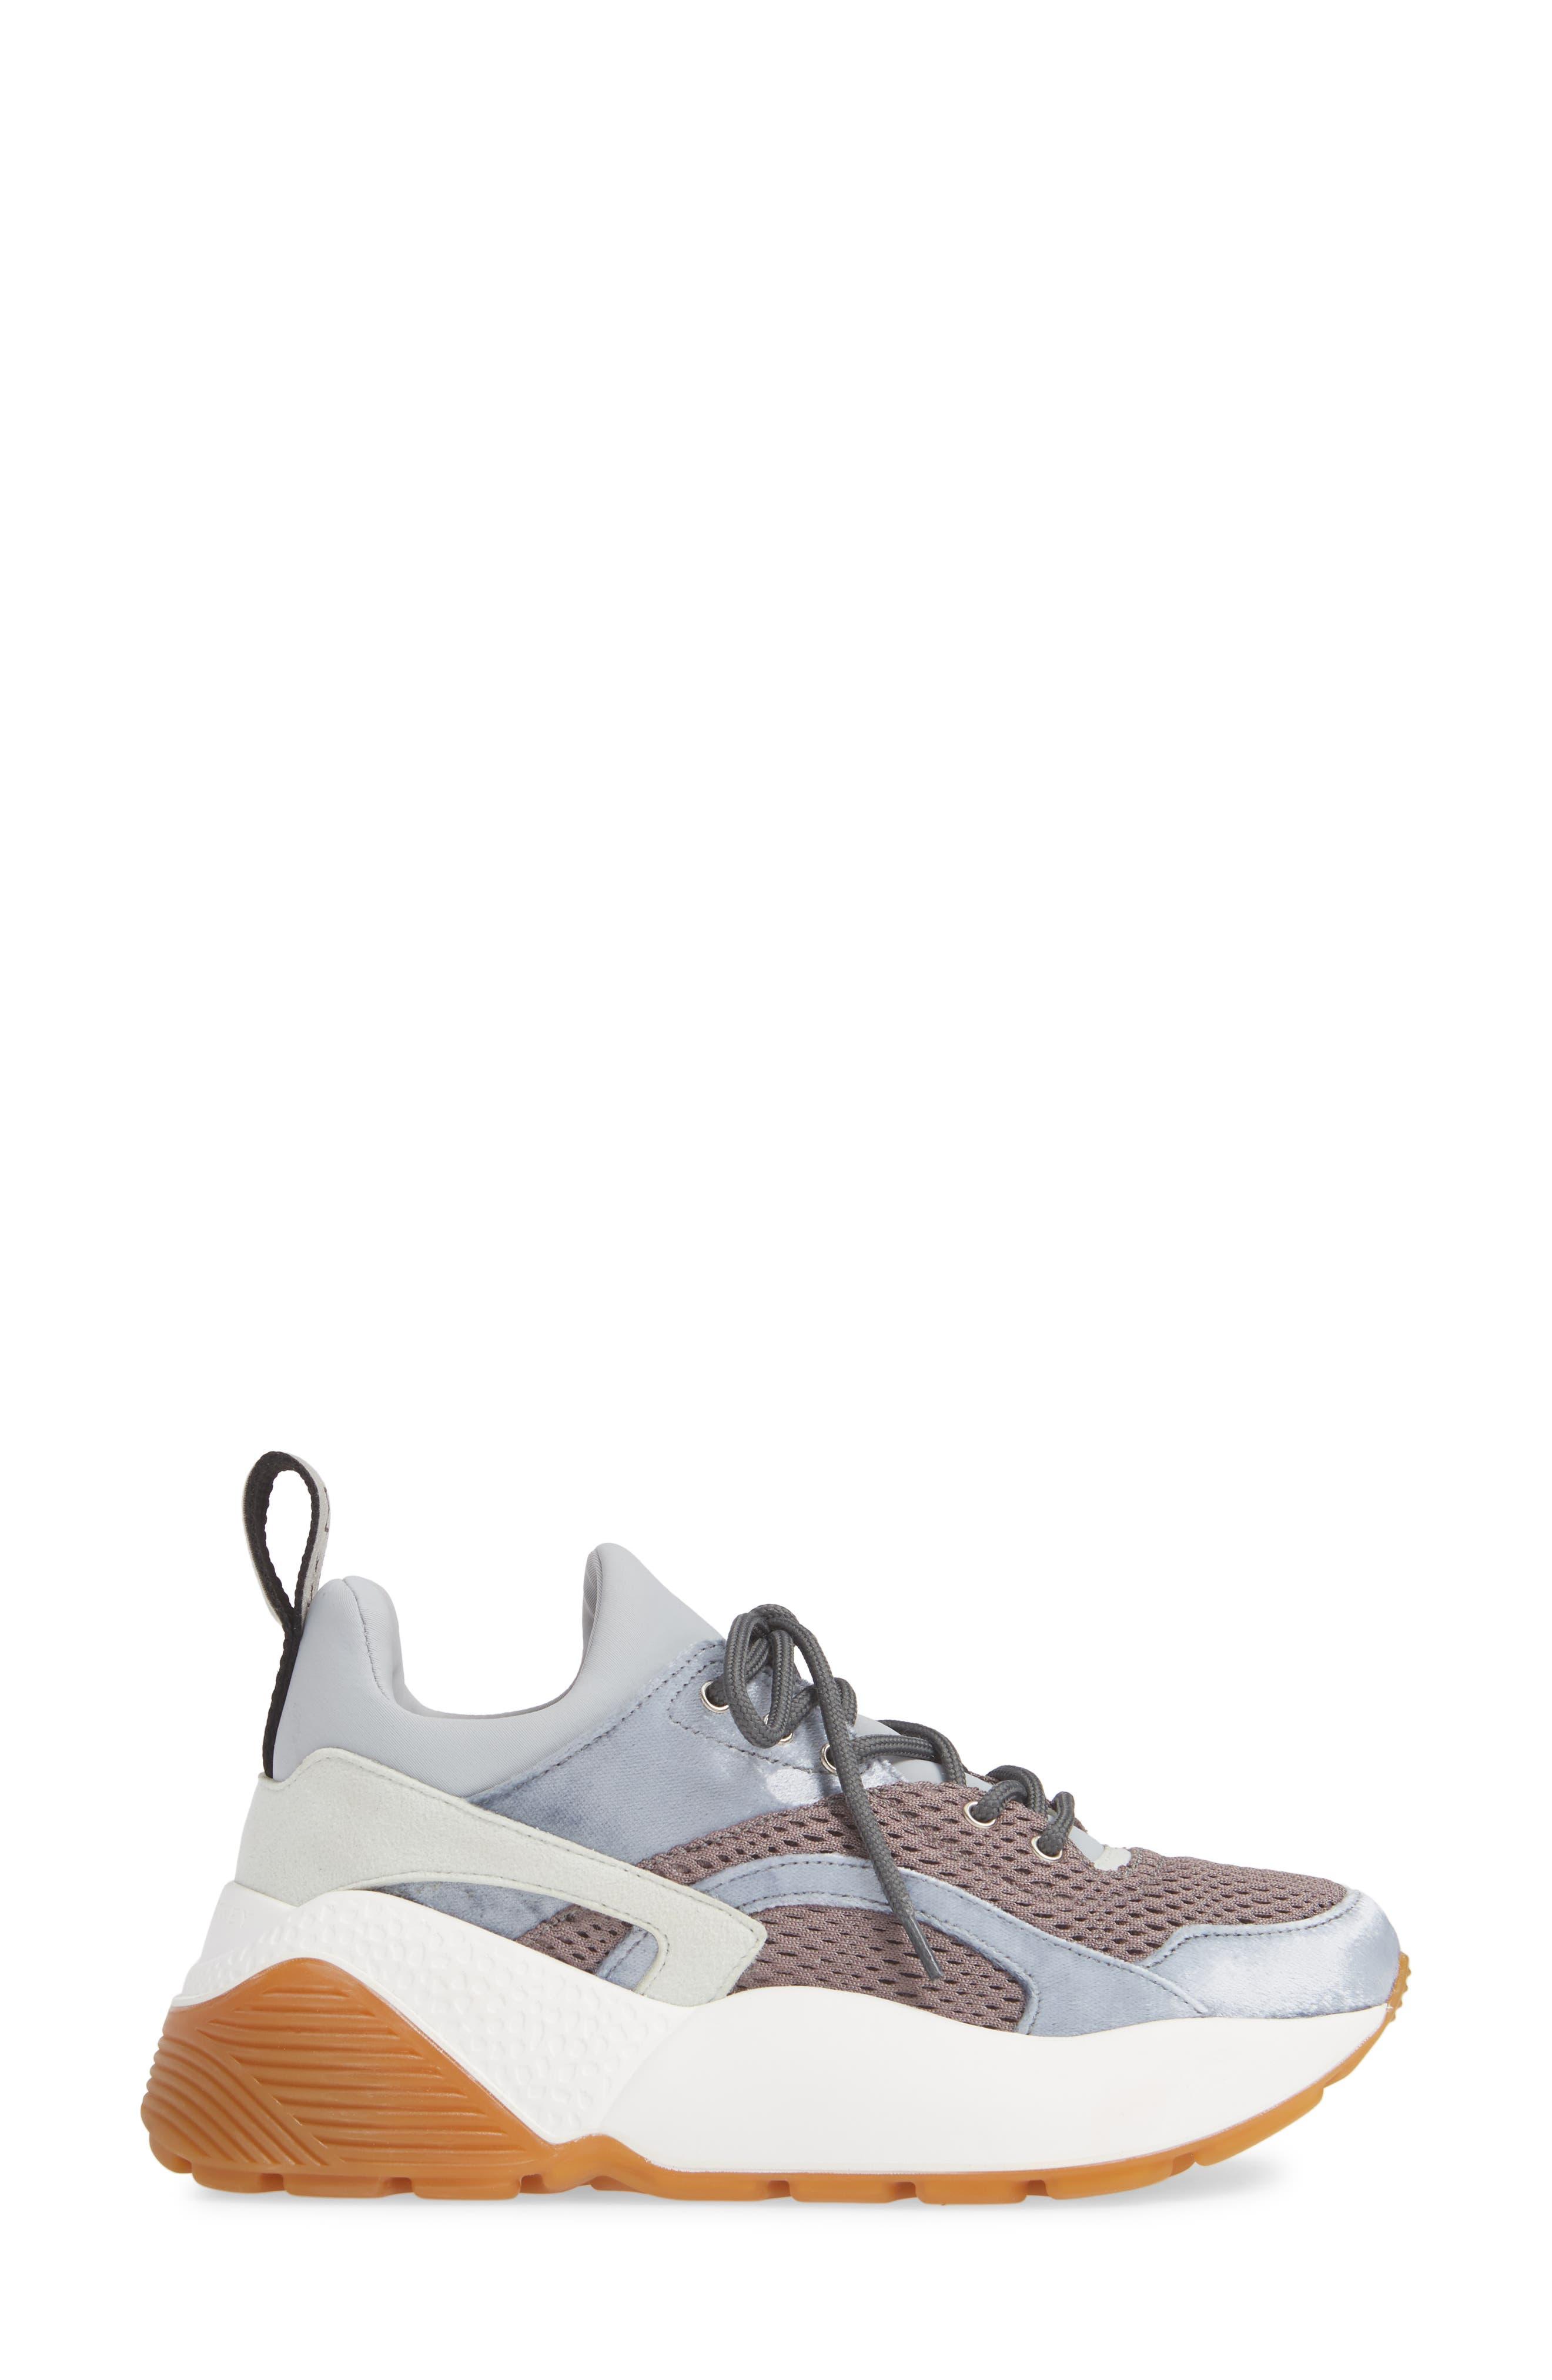 Eclypse Lace-Up Sneaker,                             Alternate thumbnail 3, color,                             GREY/ SILVER/ WHITE